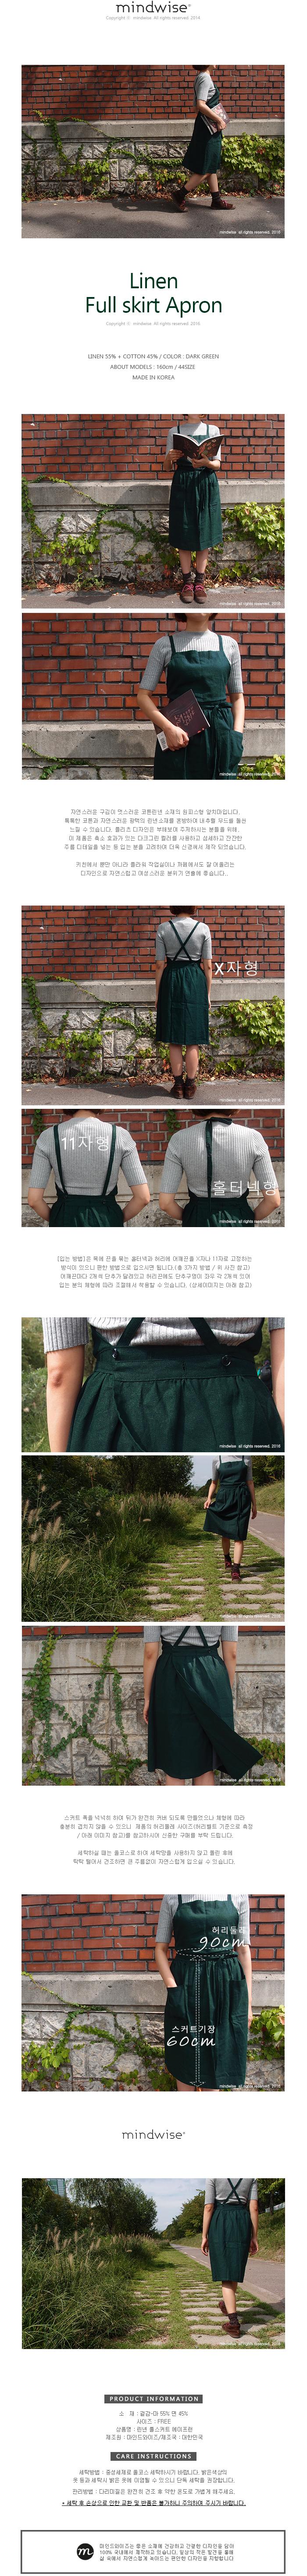 Linen apron darkgreen2